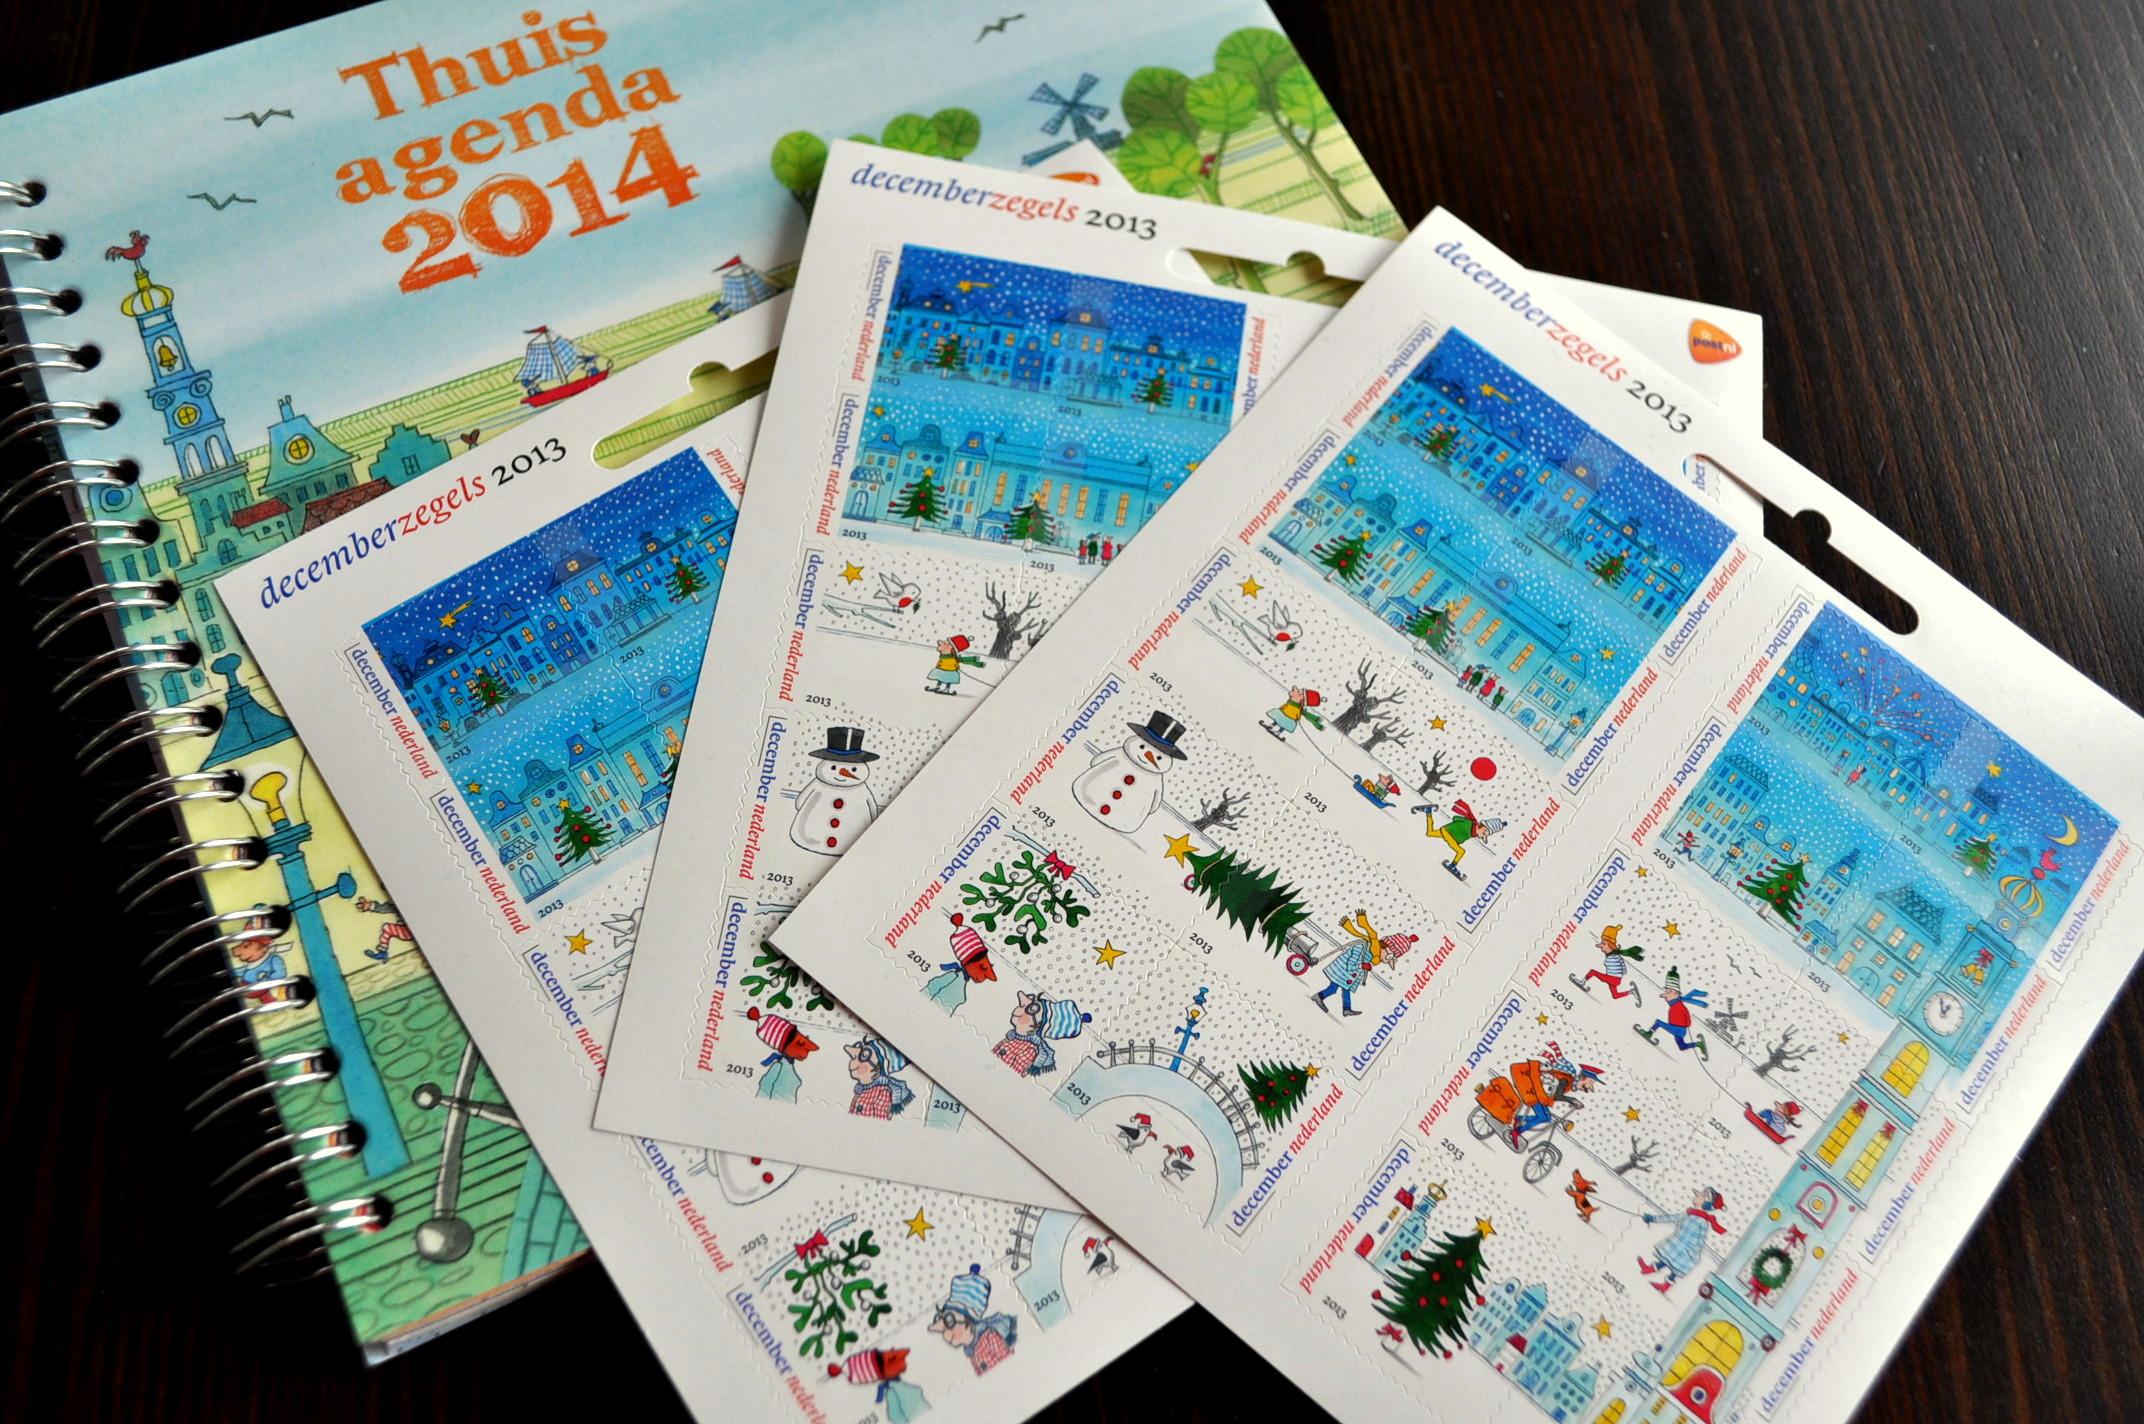 Decemberzegels 2013 - Thuisagenda 2014 PostNL